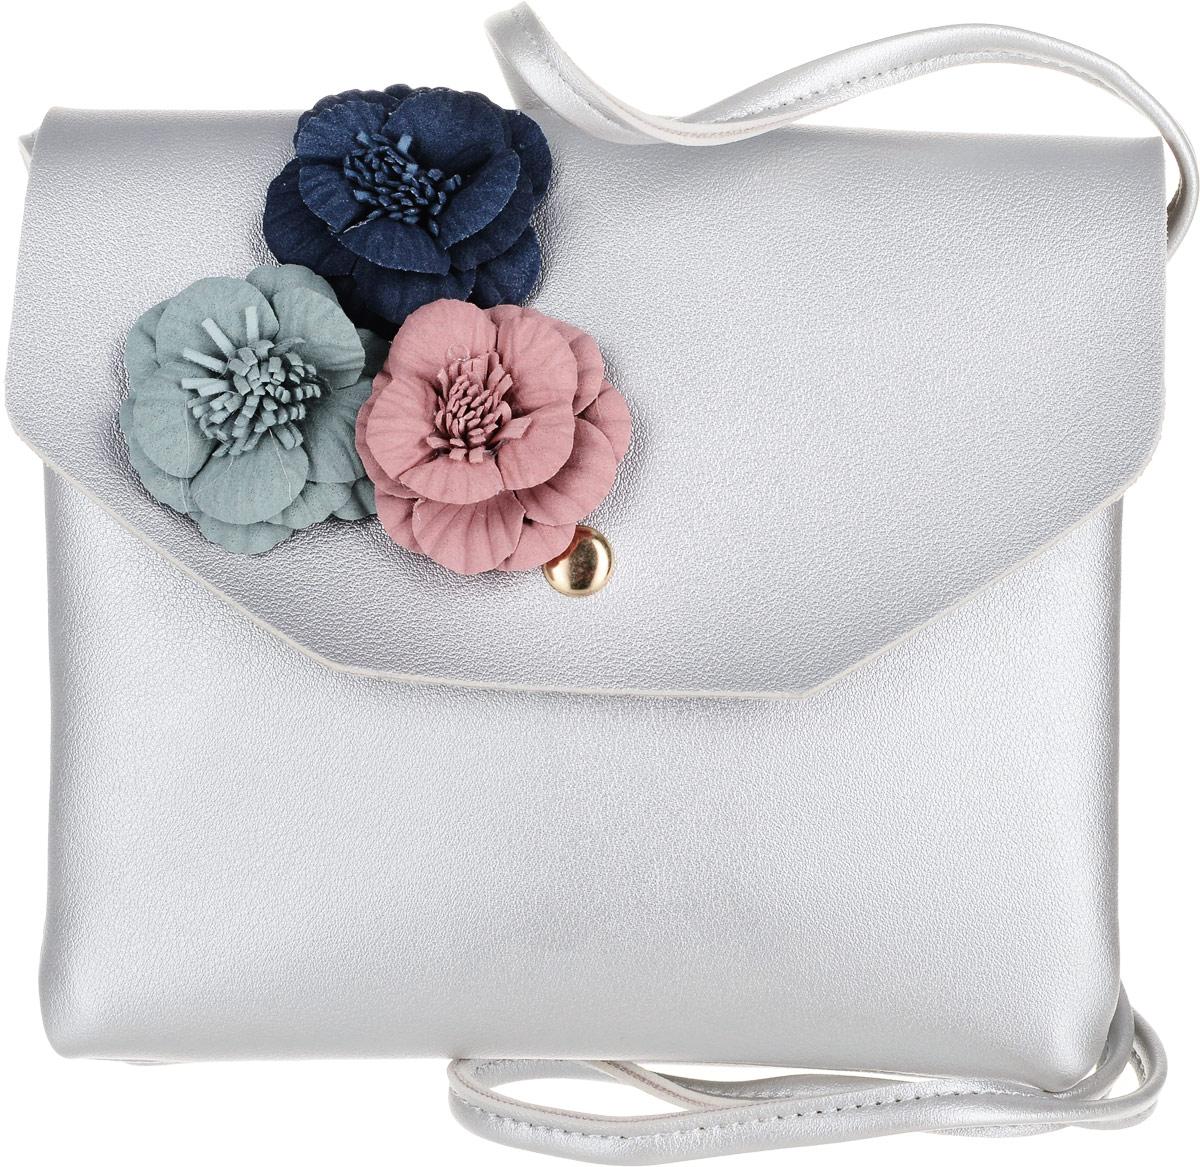 Сумка для девочки Vitacci, цвет: серый. BD0390D сумка для девочки vitacci цвет черный 1000000704